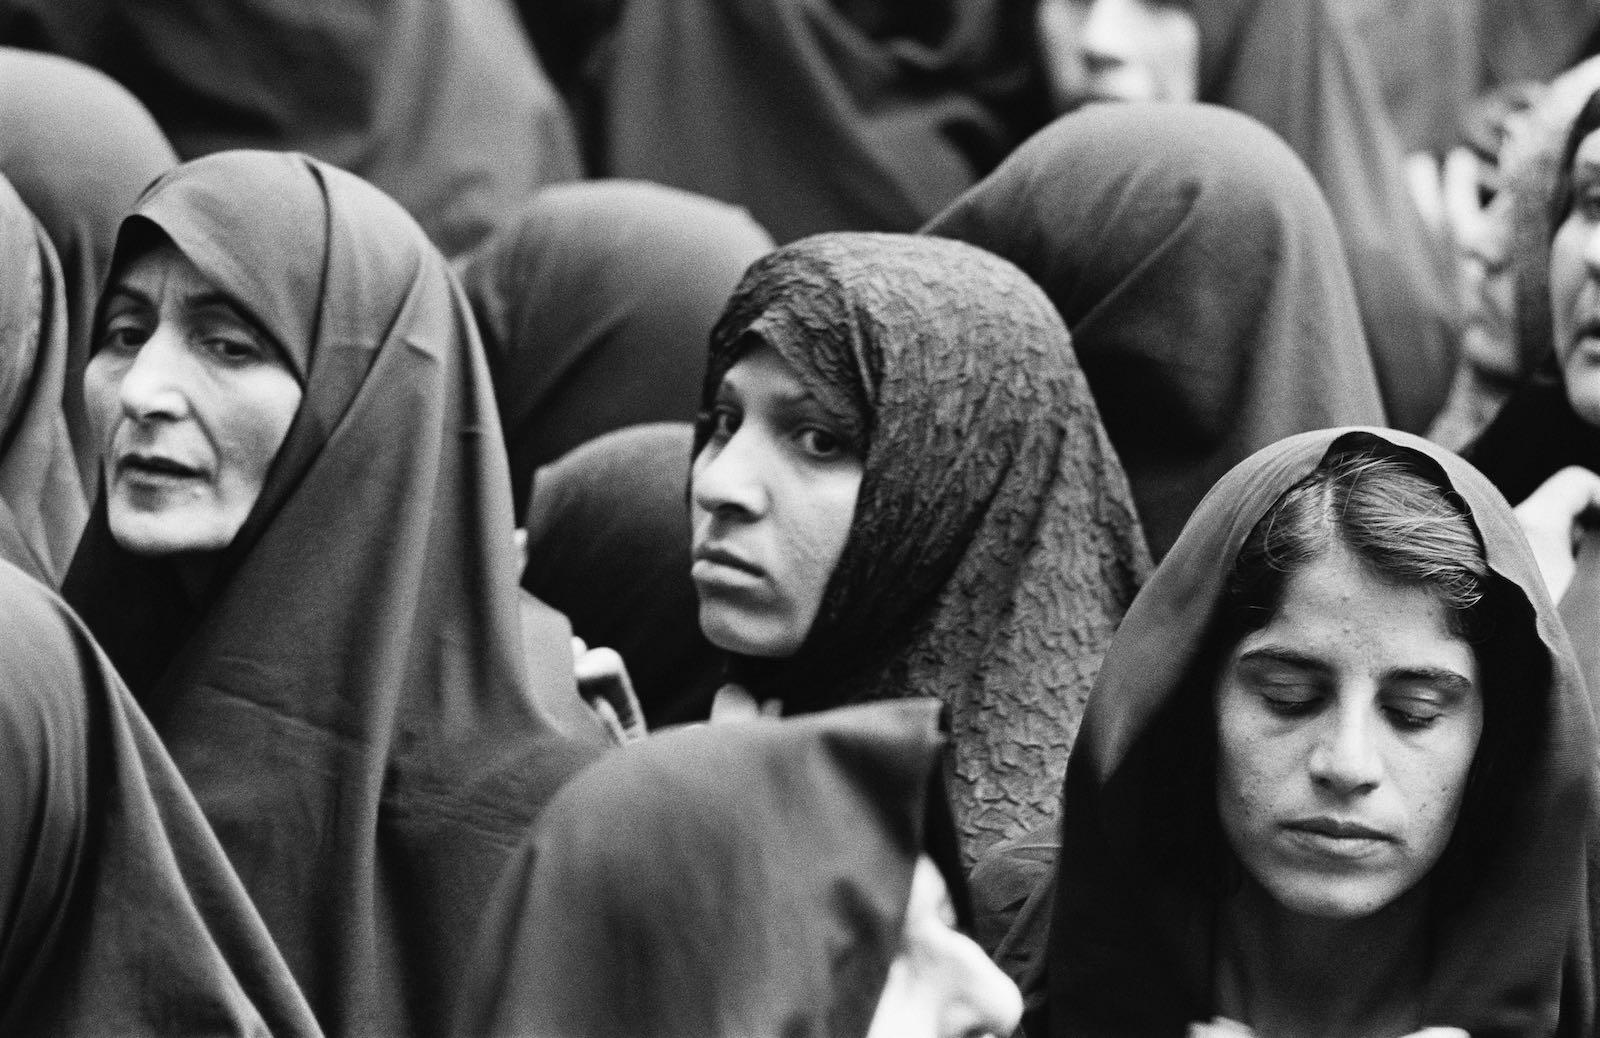 Iranian women during the Islamic Revolution, 1979